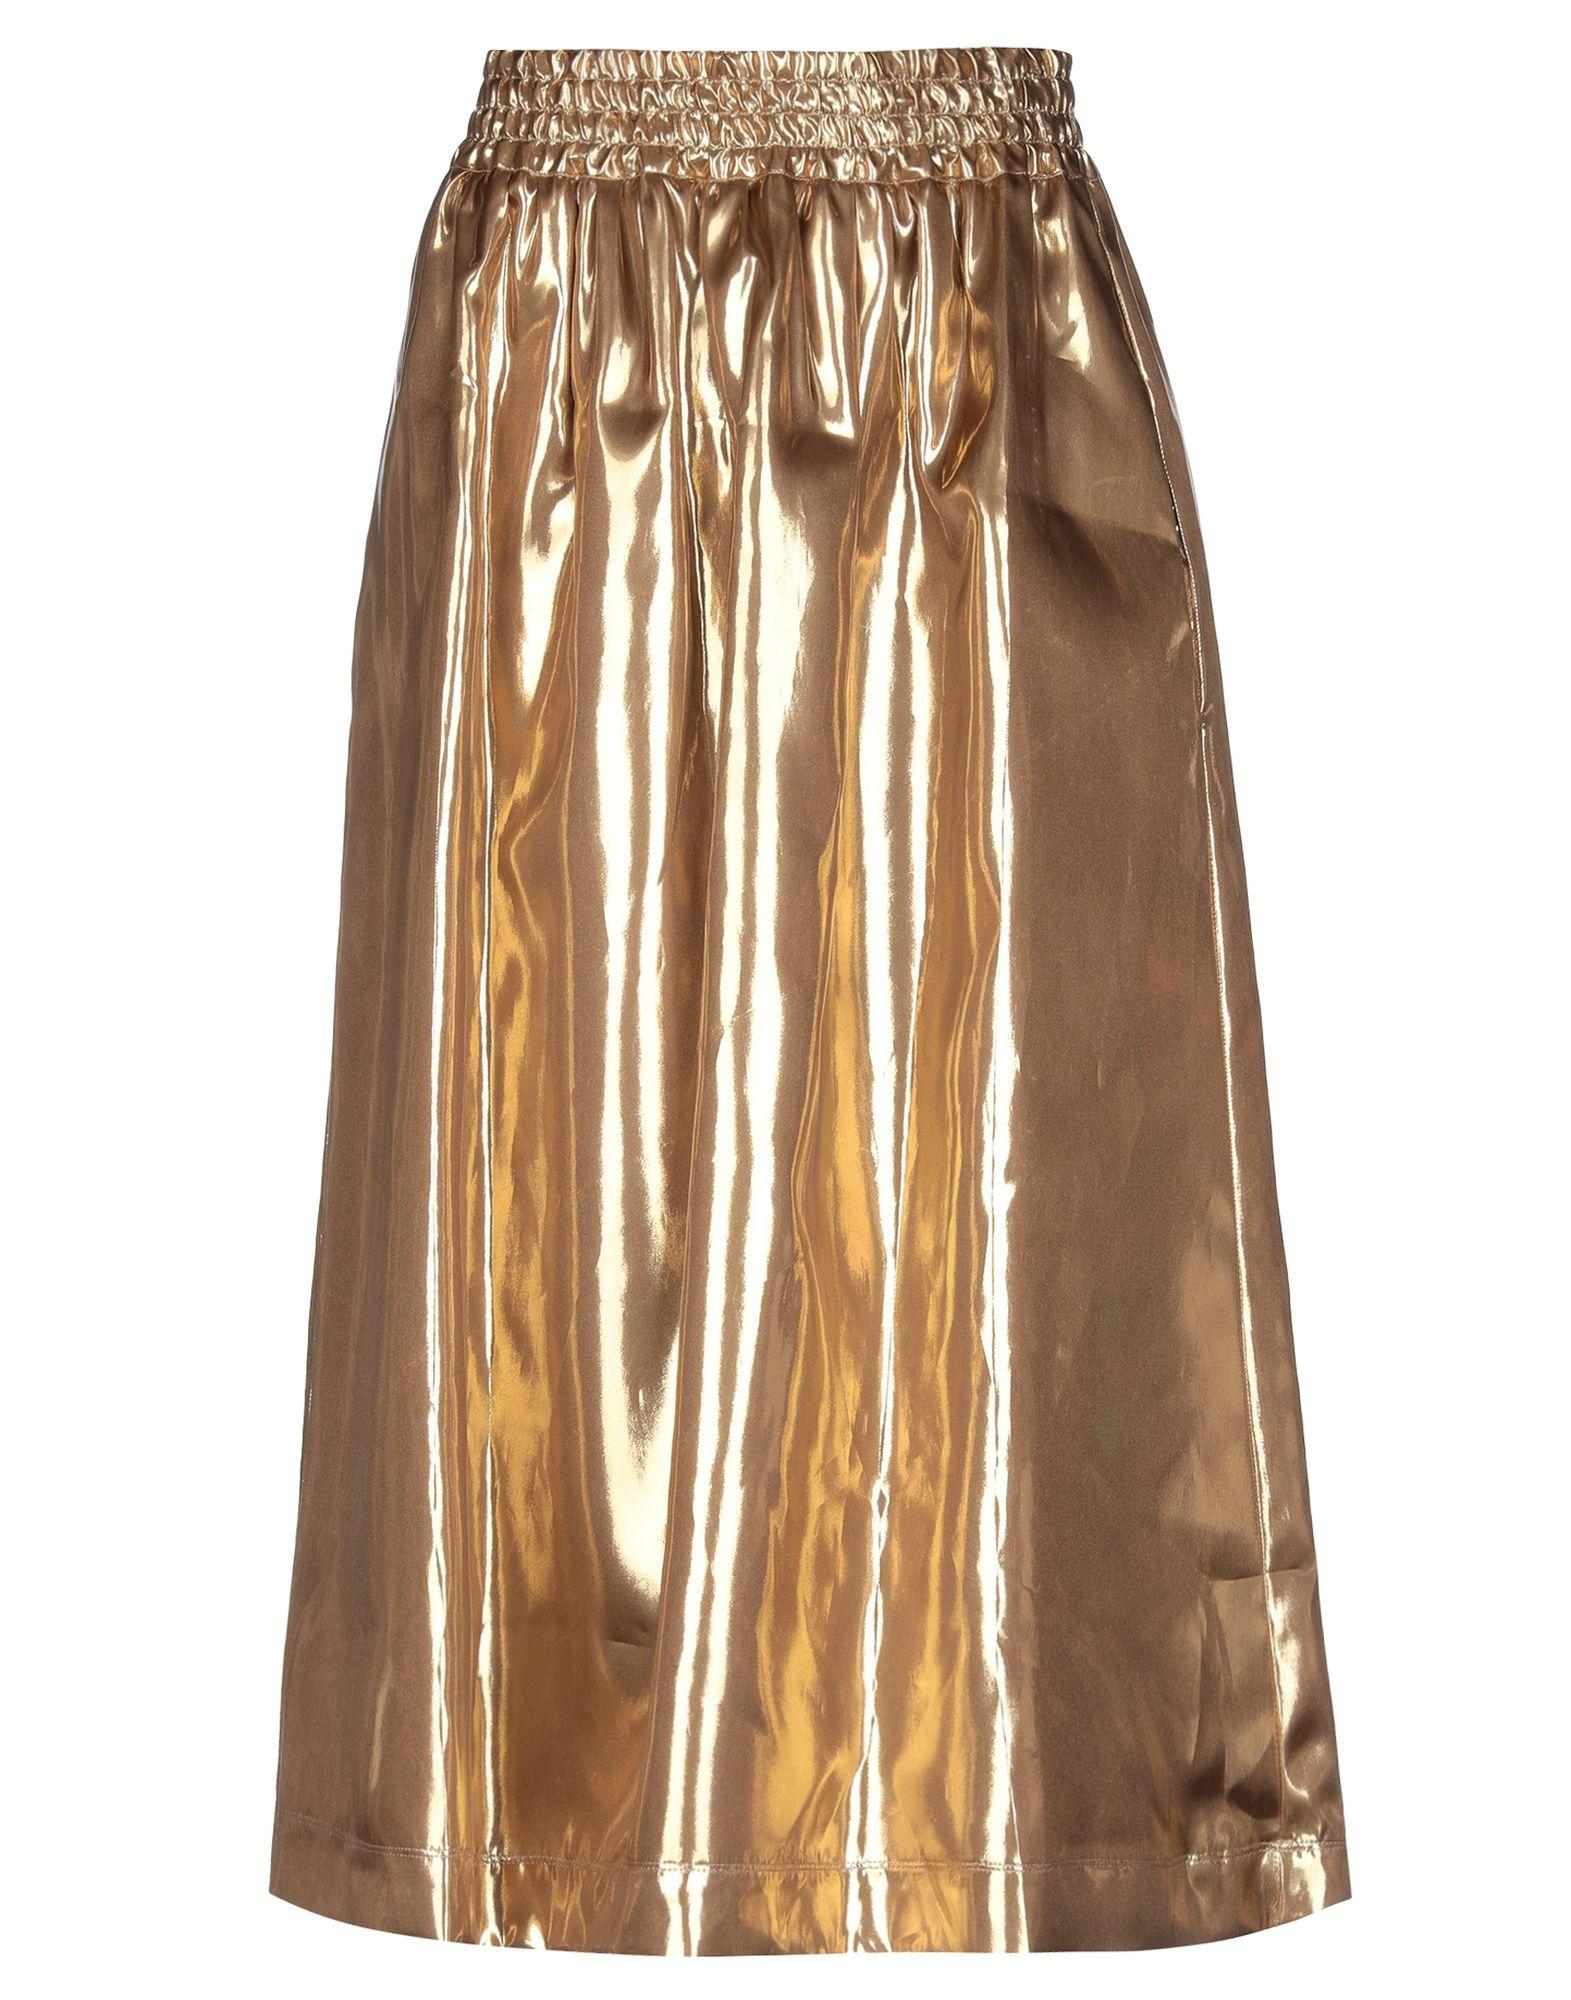 GOLDEN GOOSE DELUXE BRAND Юбка длиной 3/4 gold plated banana plug jack connector set golden 3 5mm 10 pairs